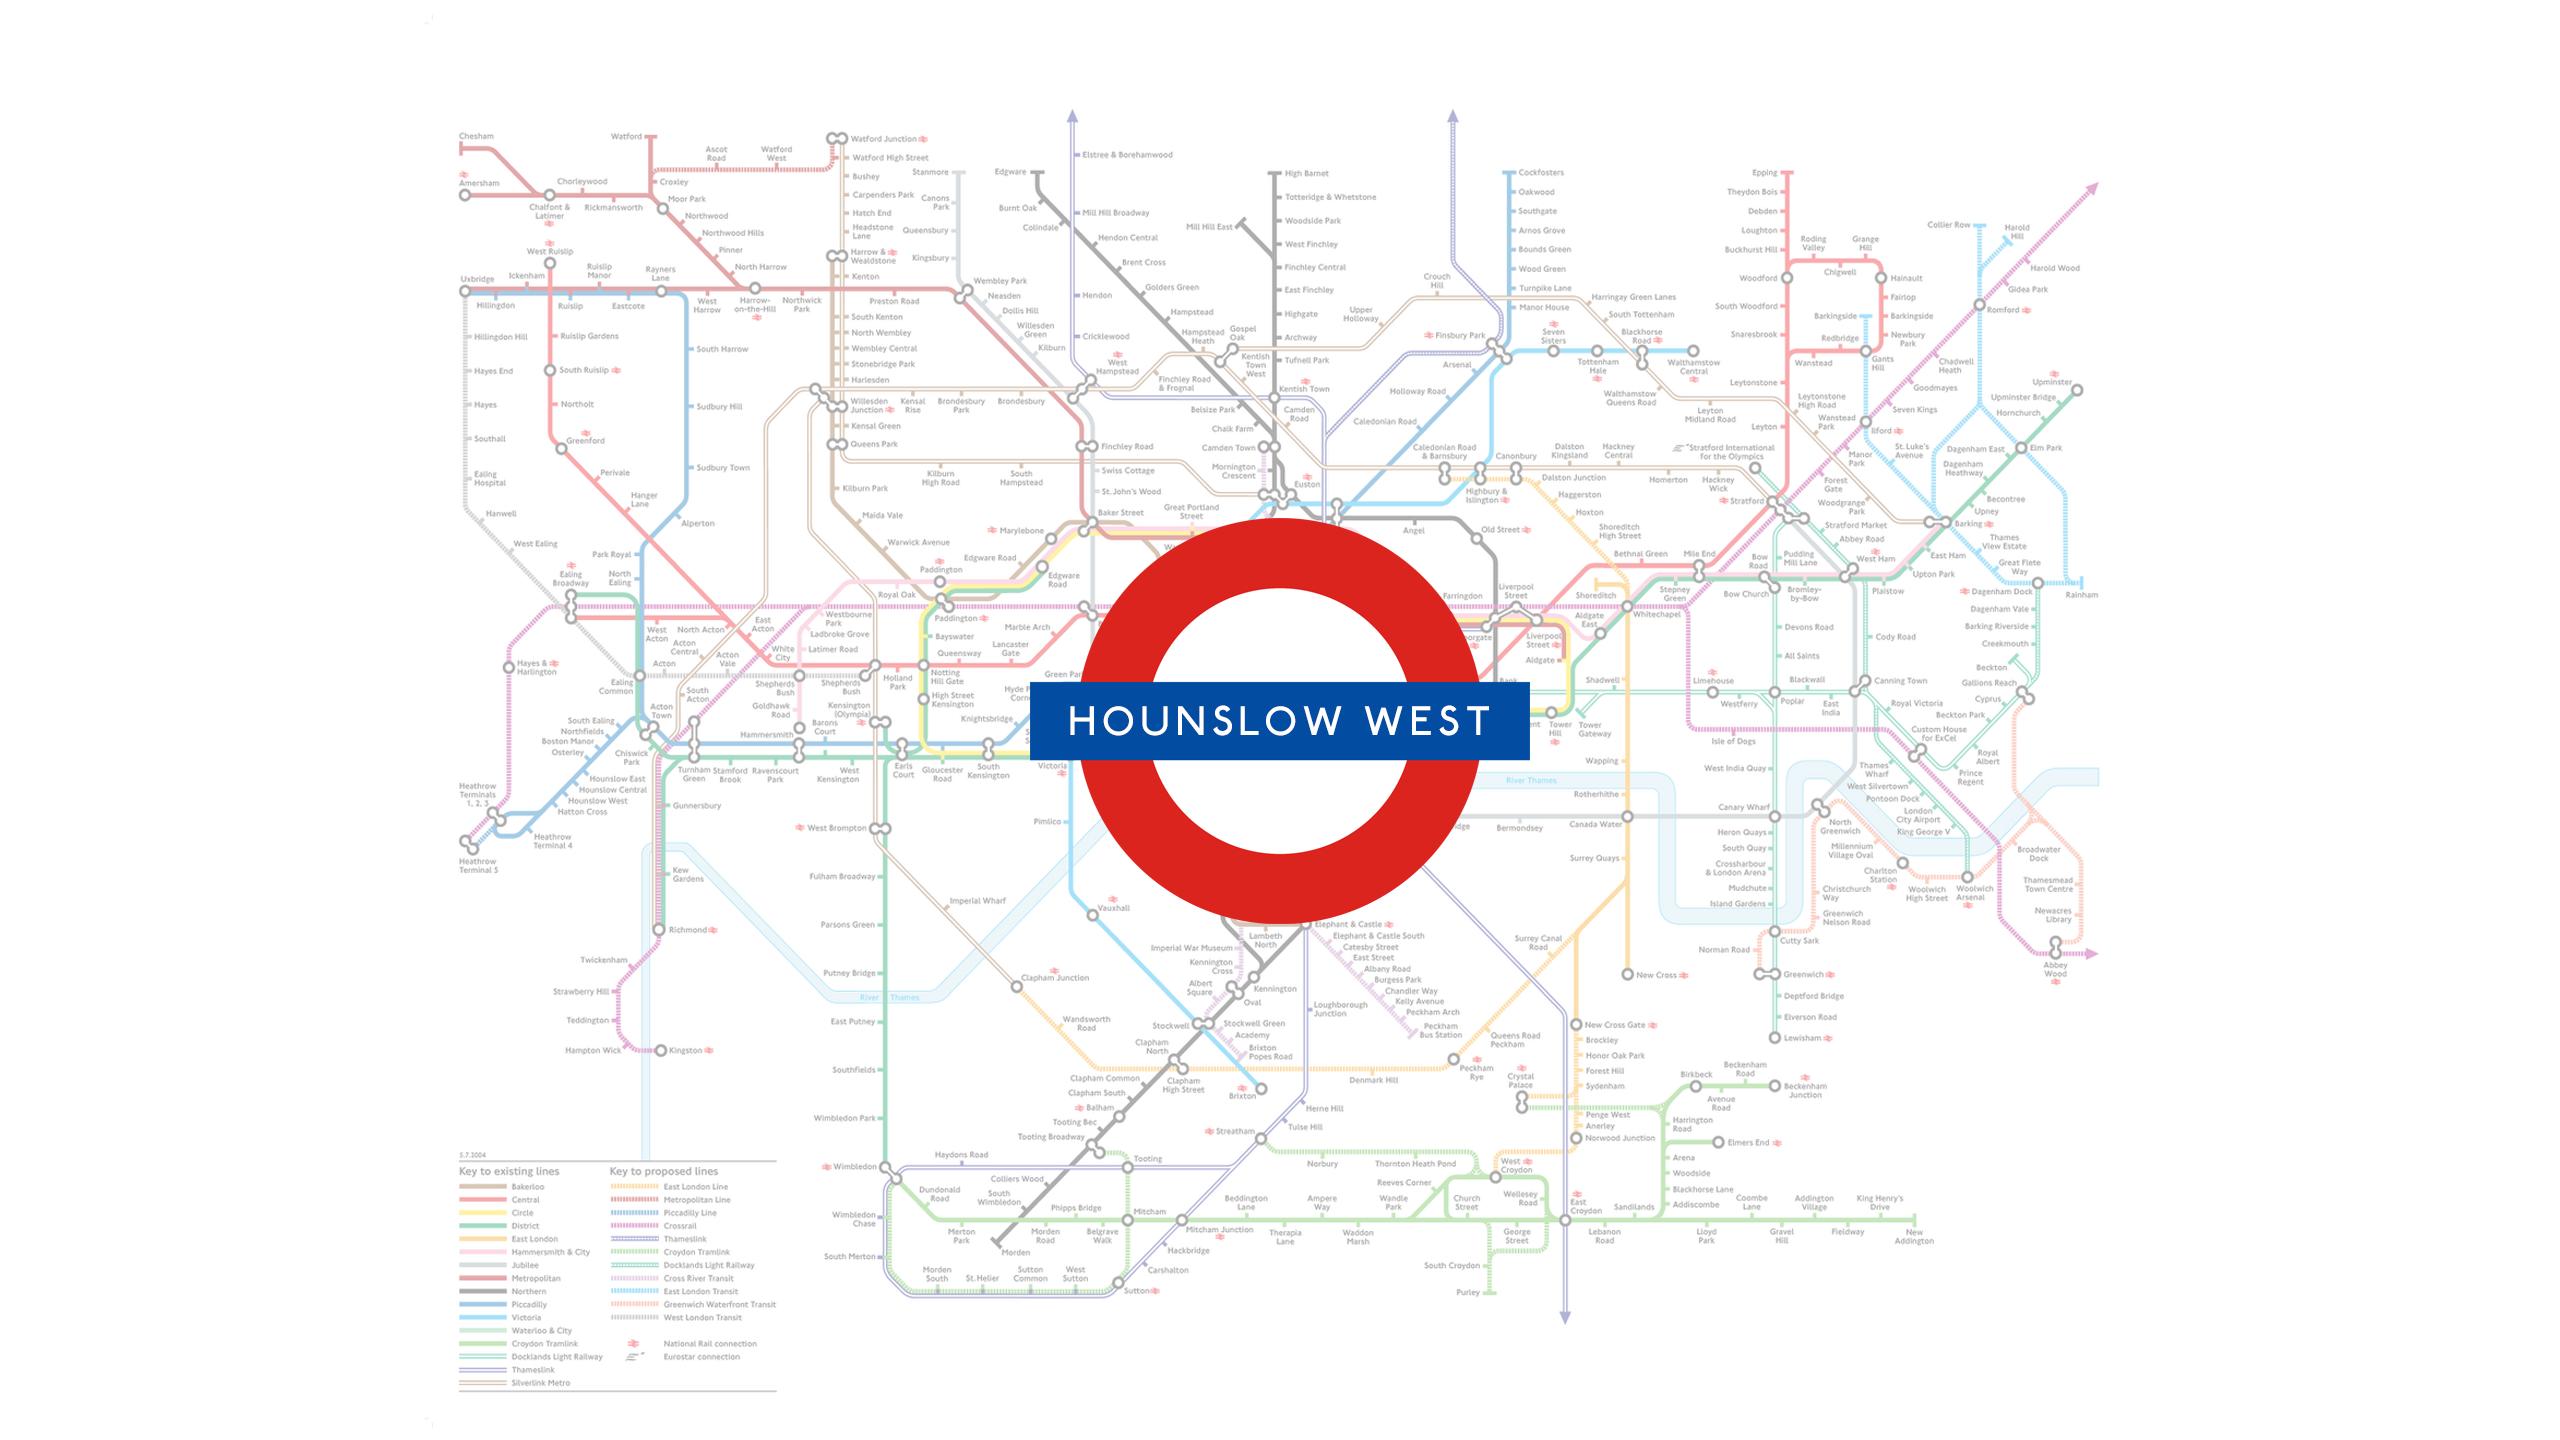 Hounslow West (Map)